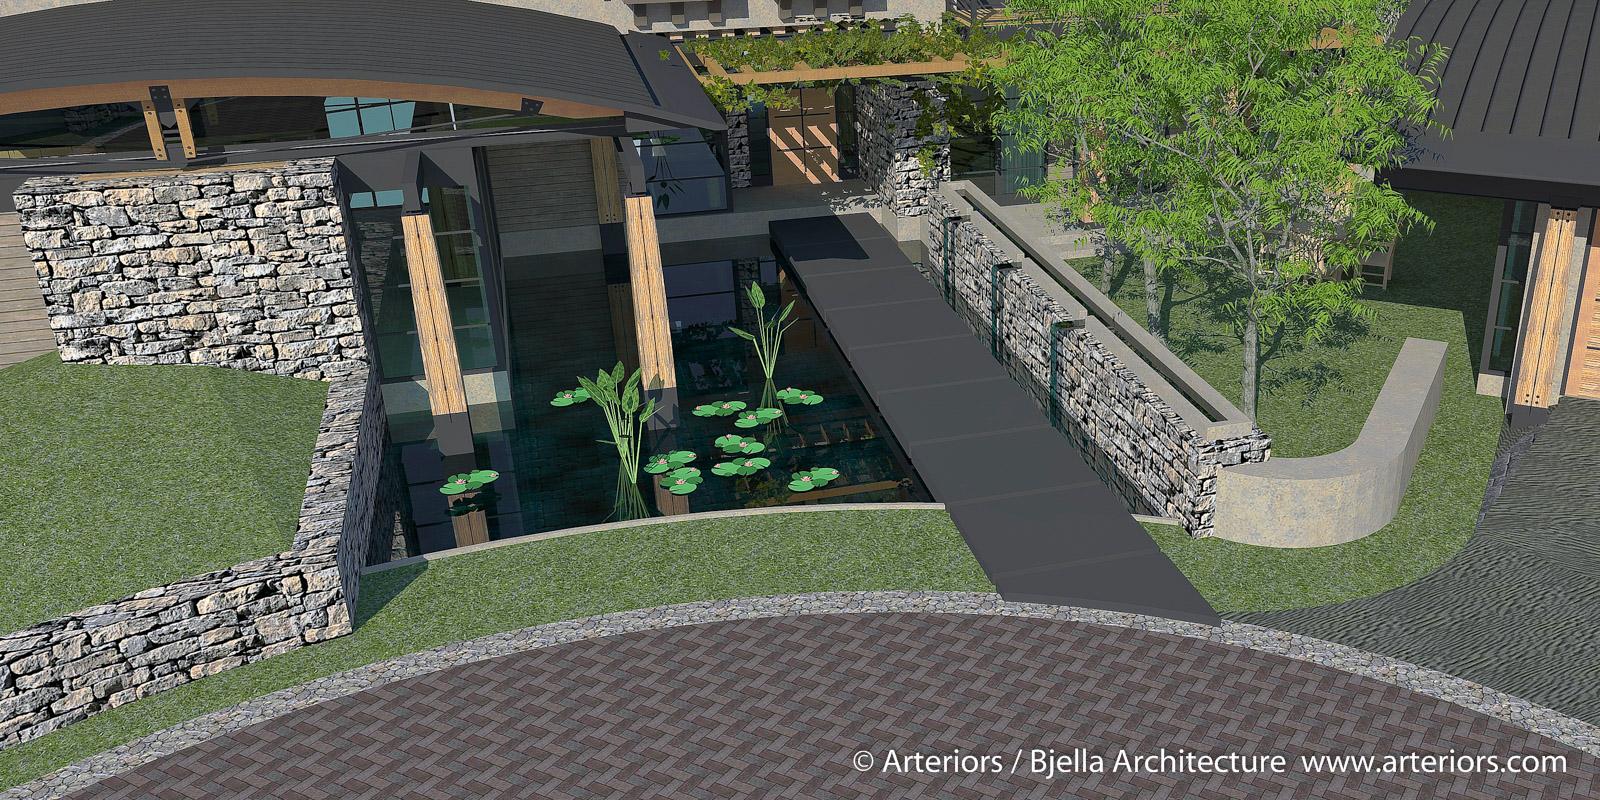 modern-calabasas-home-by-arteriors-architects-bjella-4